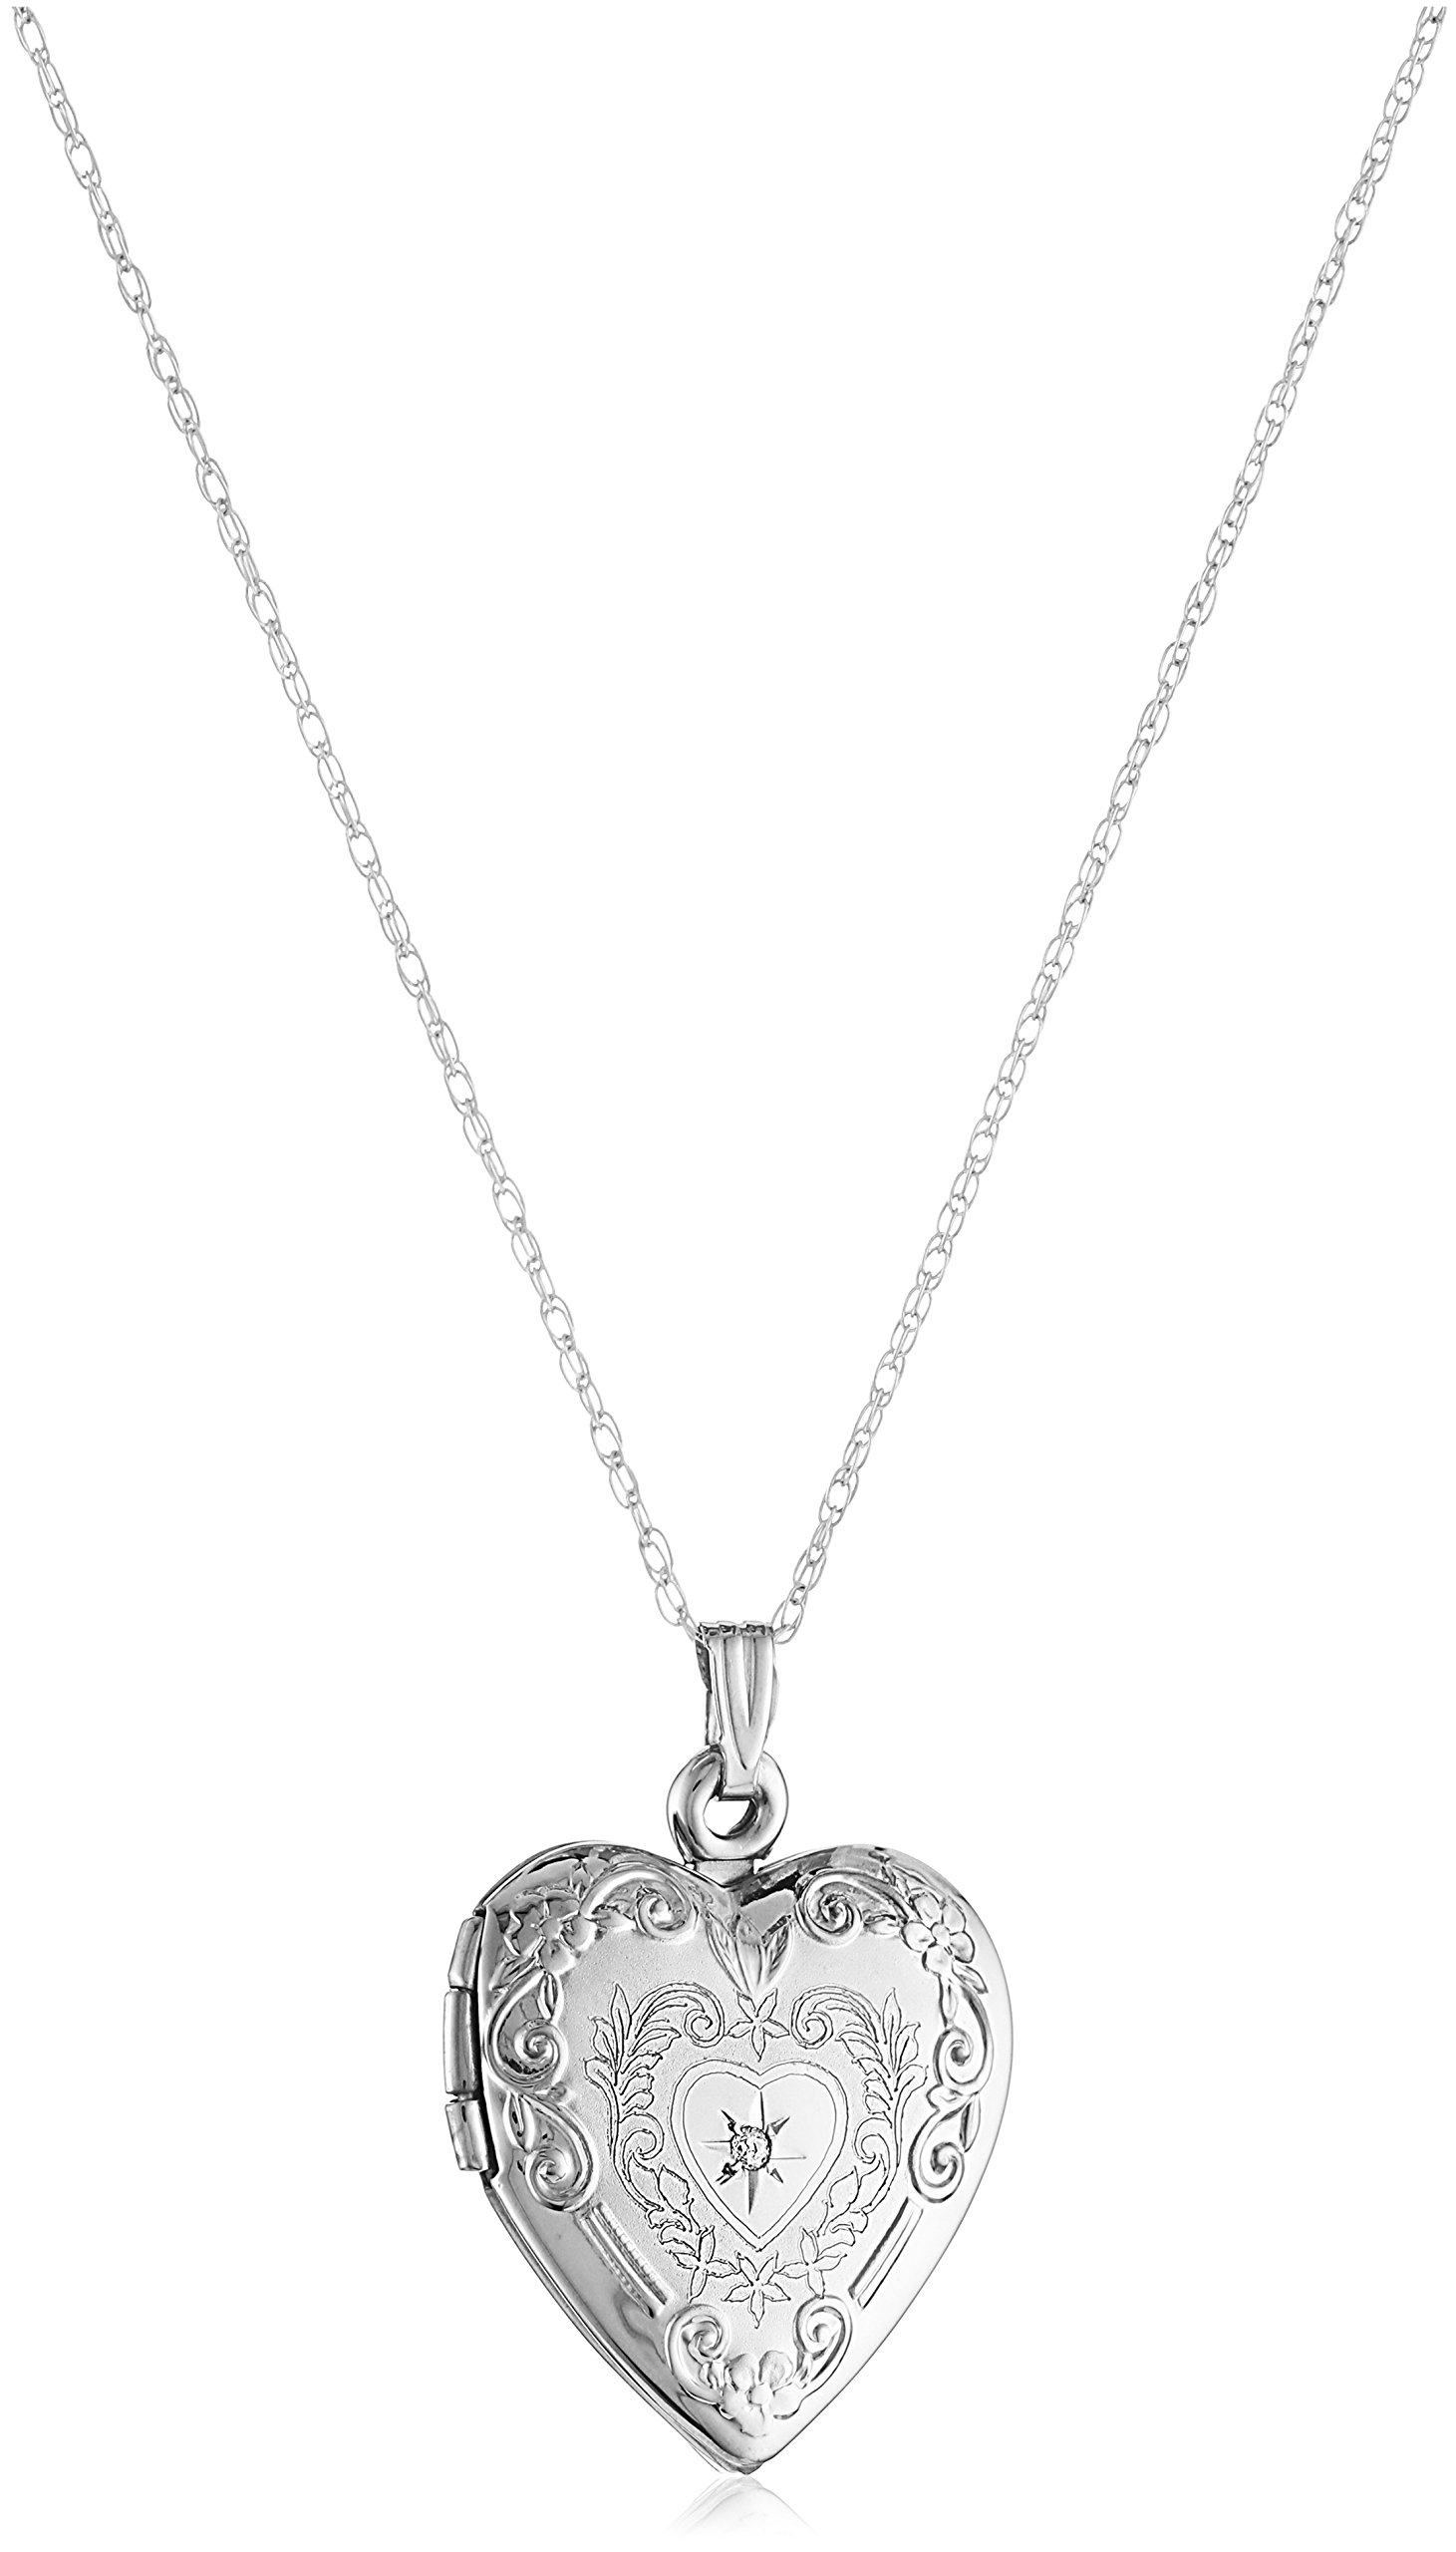 10k White Gold Diamond Heart Locket Necklace, 18''